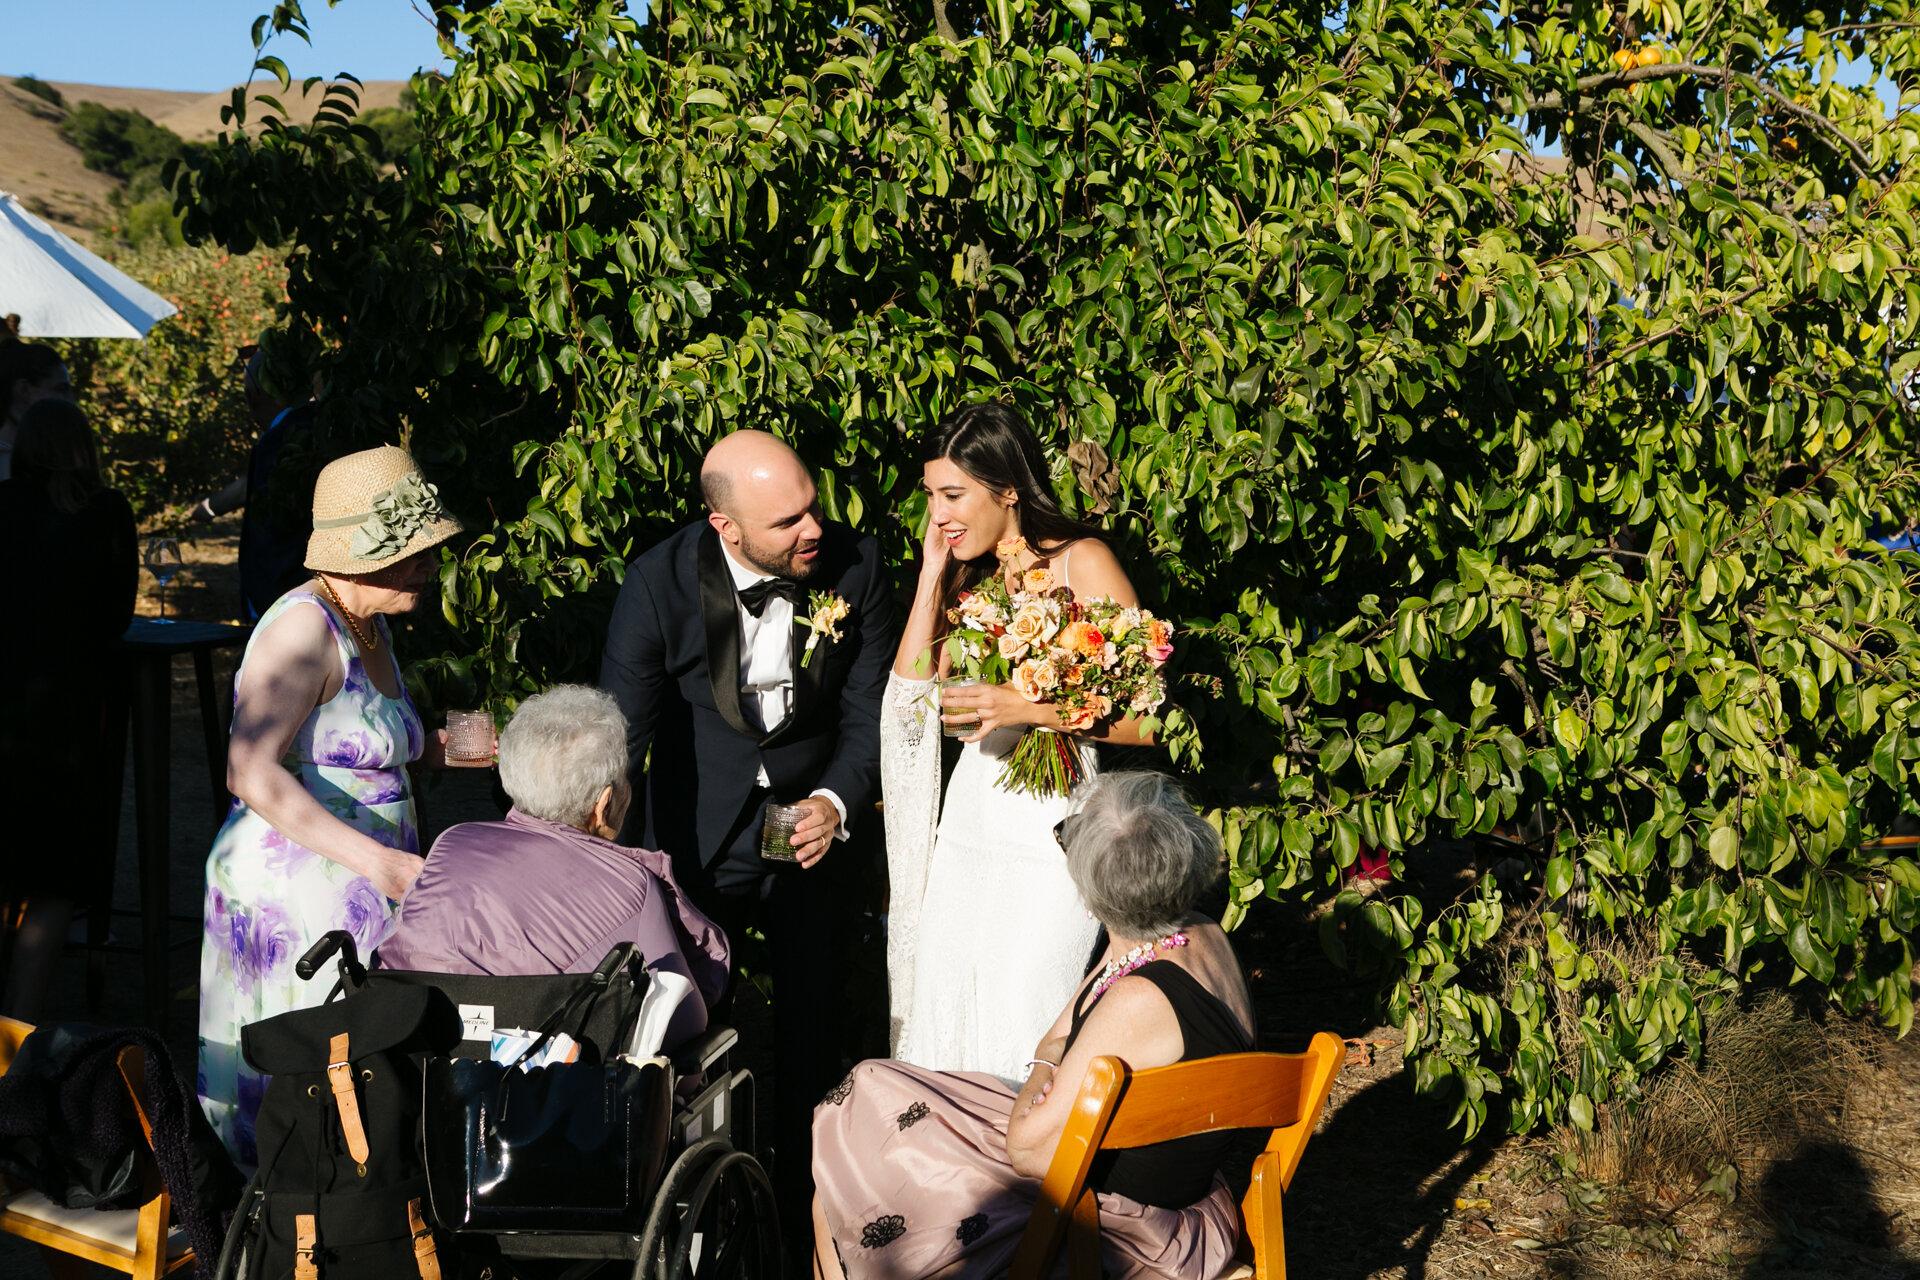 KBWeddings_HeatherRyder_WeddingPreview_F4A2075.jpg